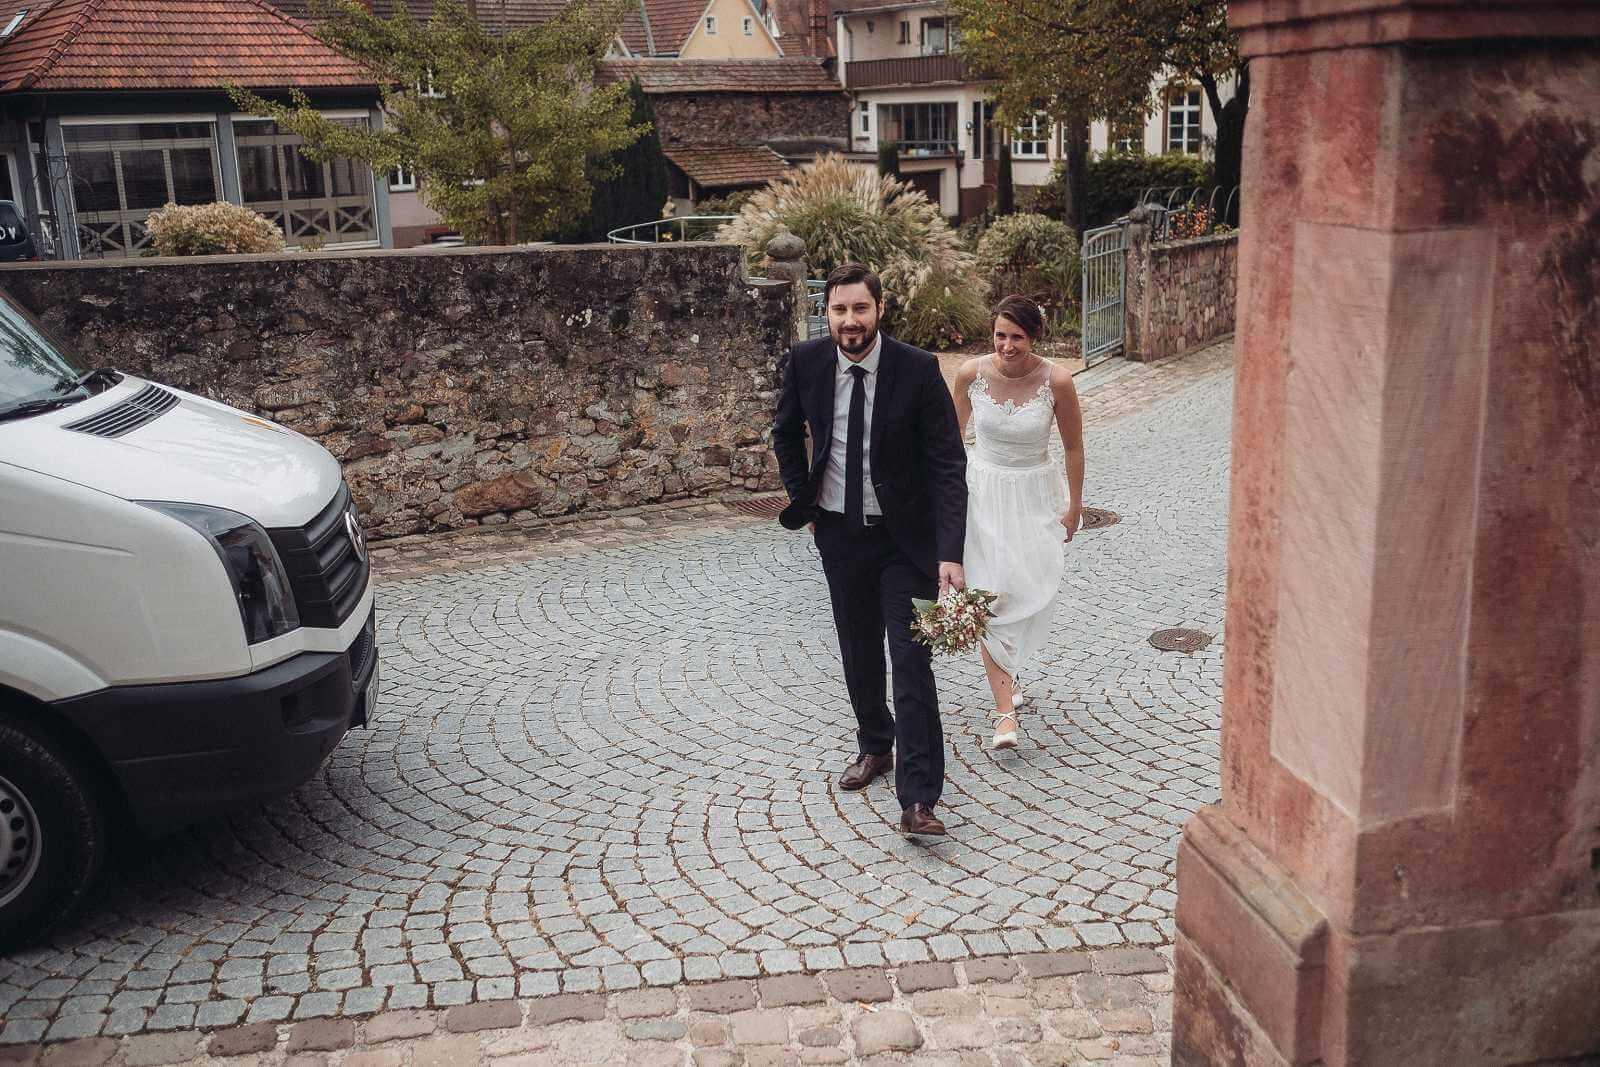 Hochzeitsfotograf Offenburg Zell am Harmersbach Bärenkeller (36)